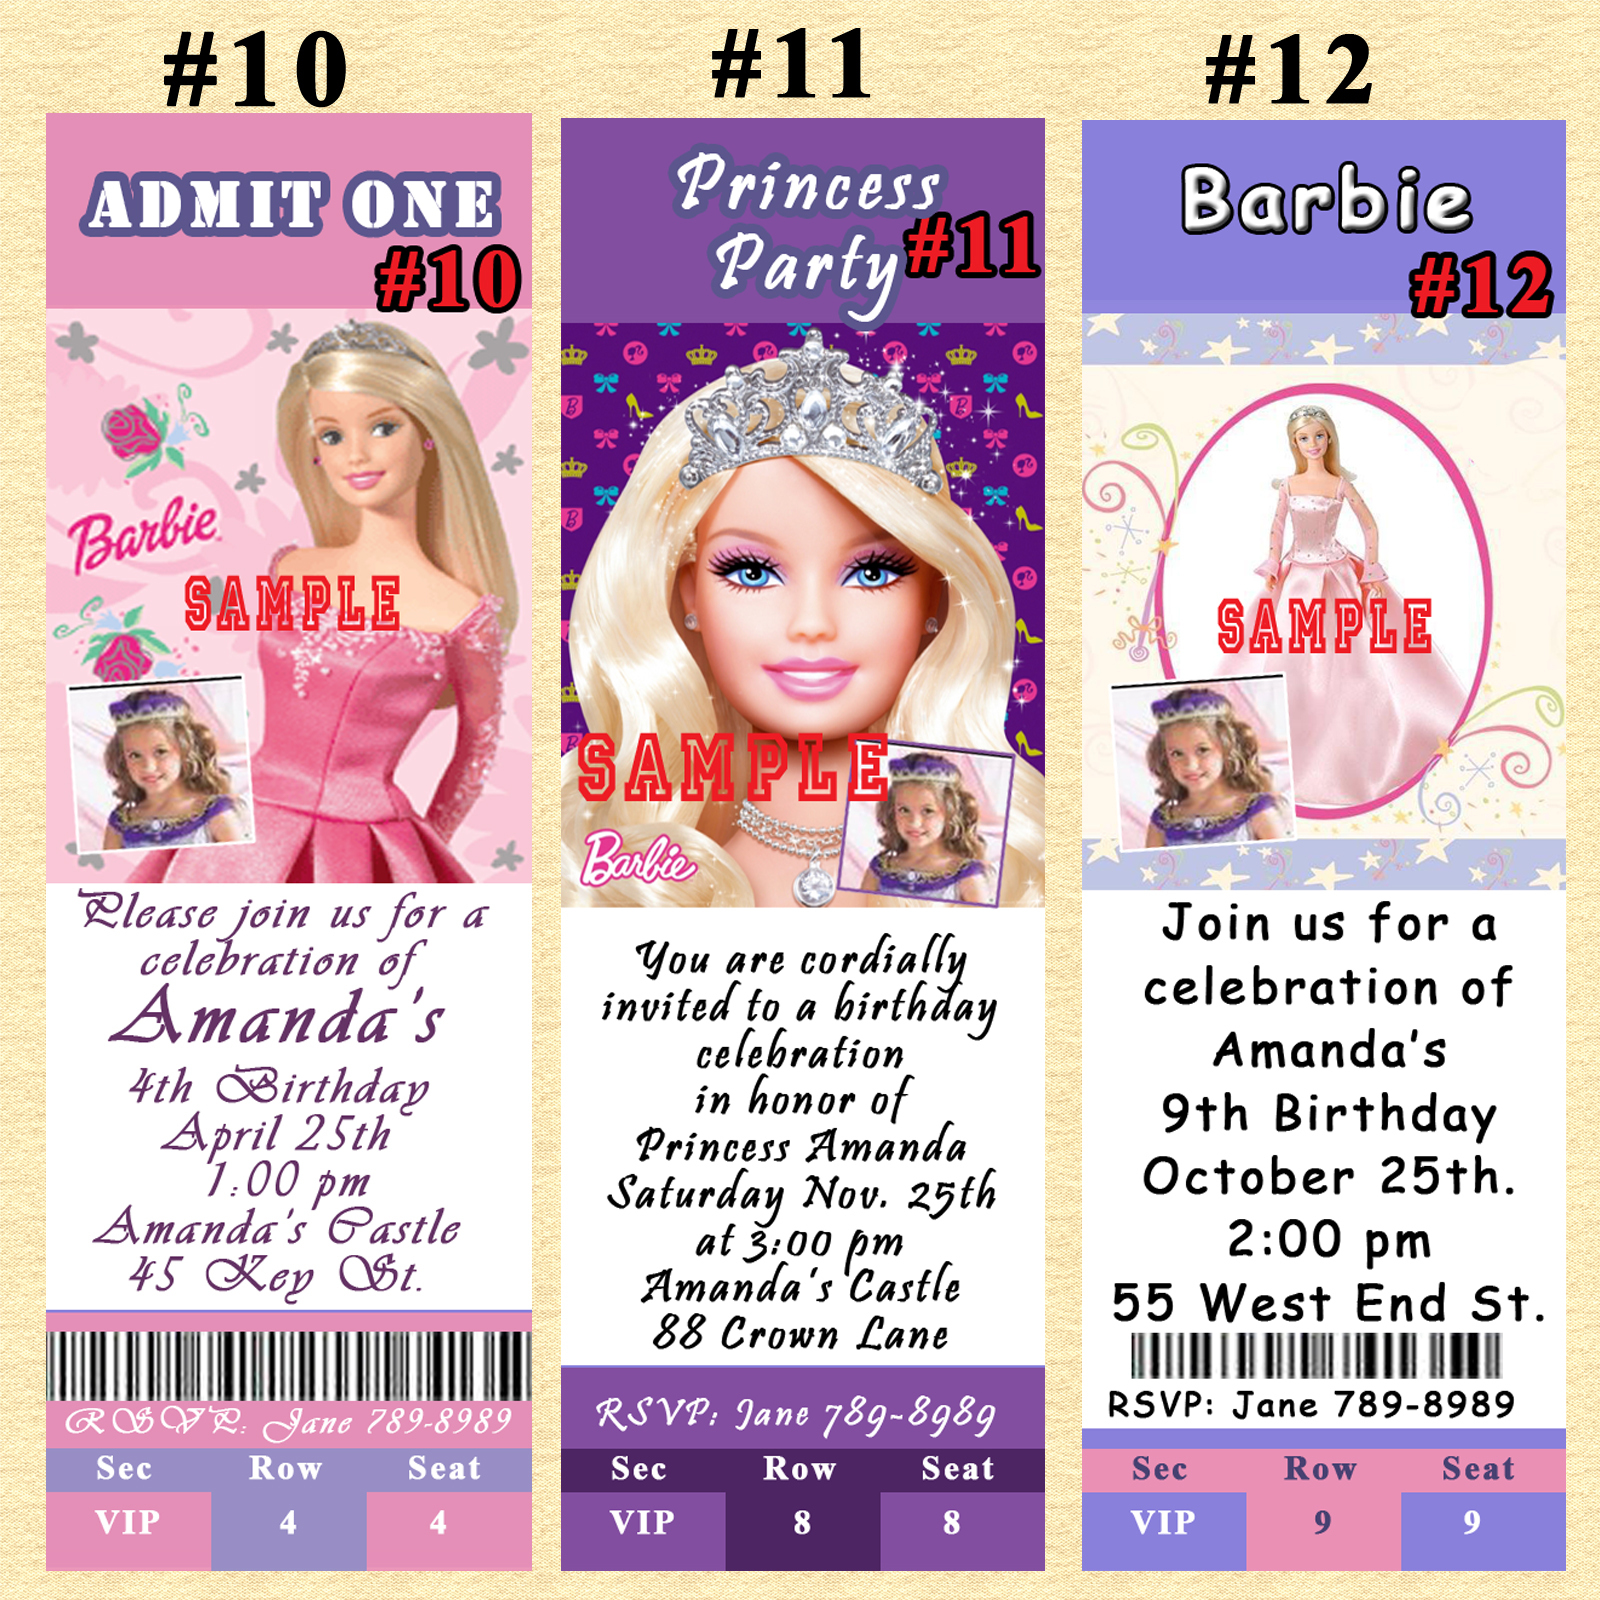 Srprintingservice Barbie Invitation 1 listing